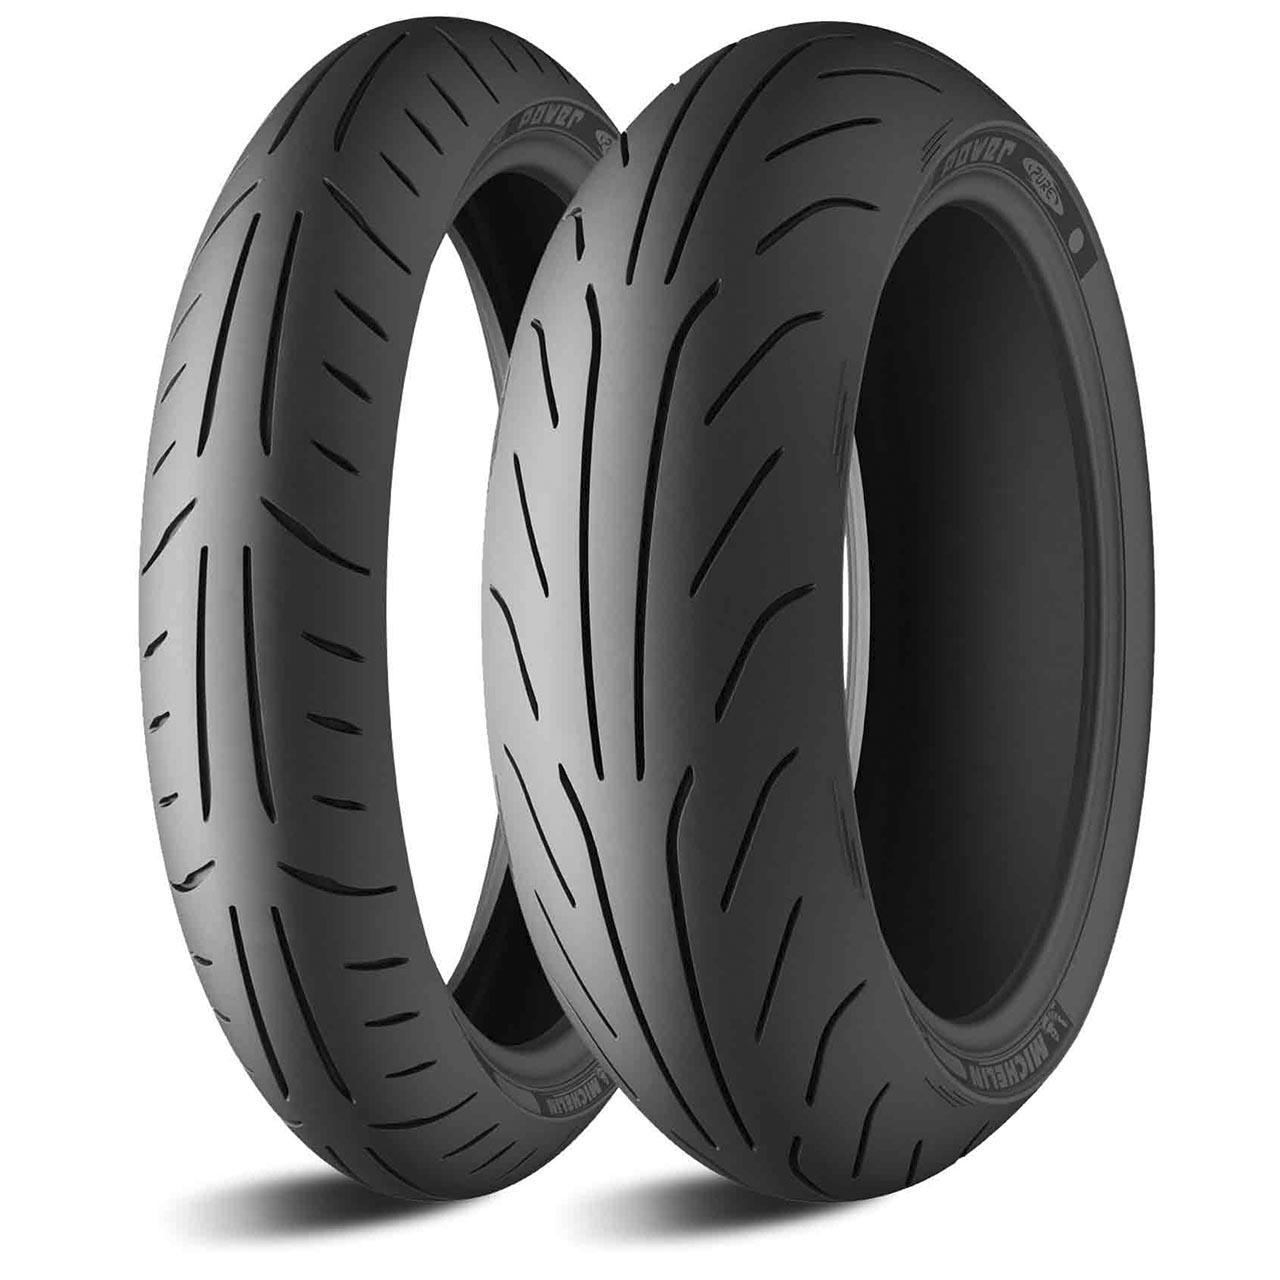 Michelin Power Pure SC RF Rear 130/70-12 62P TL